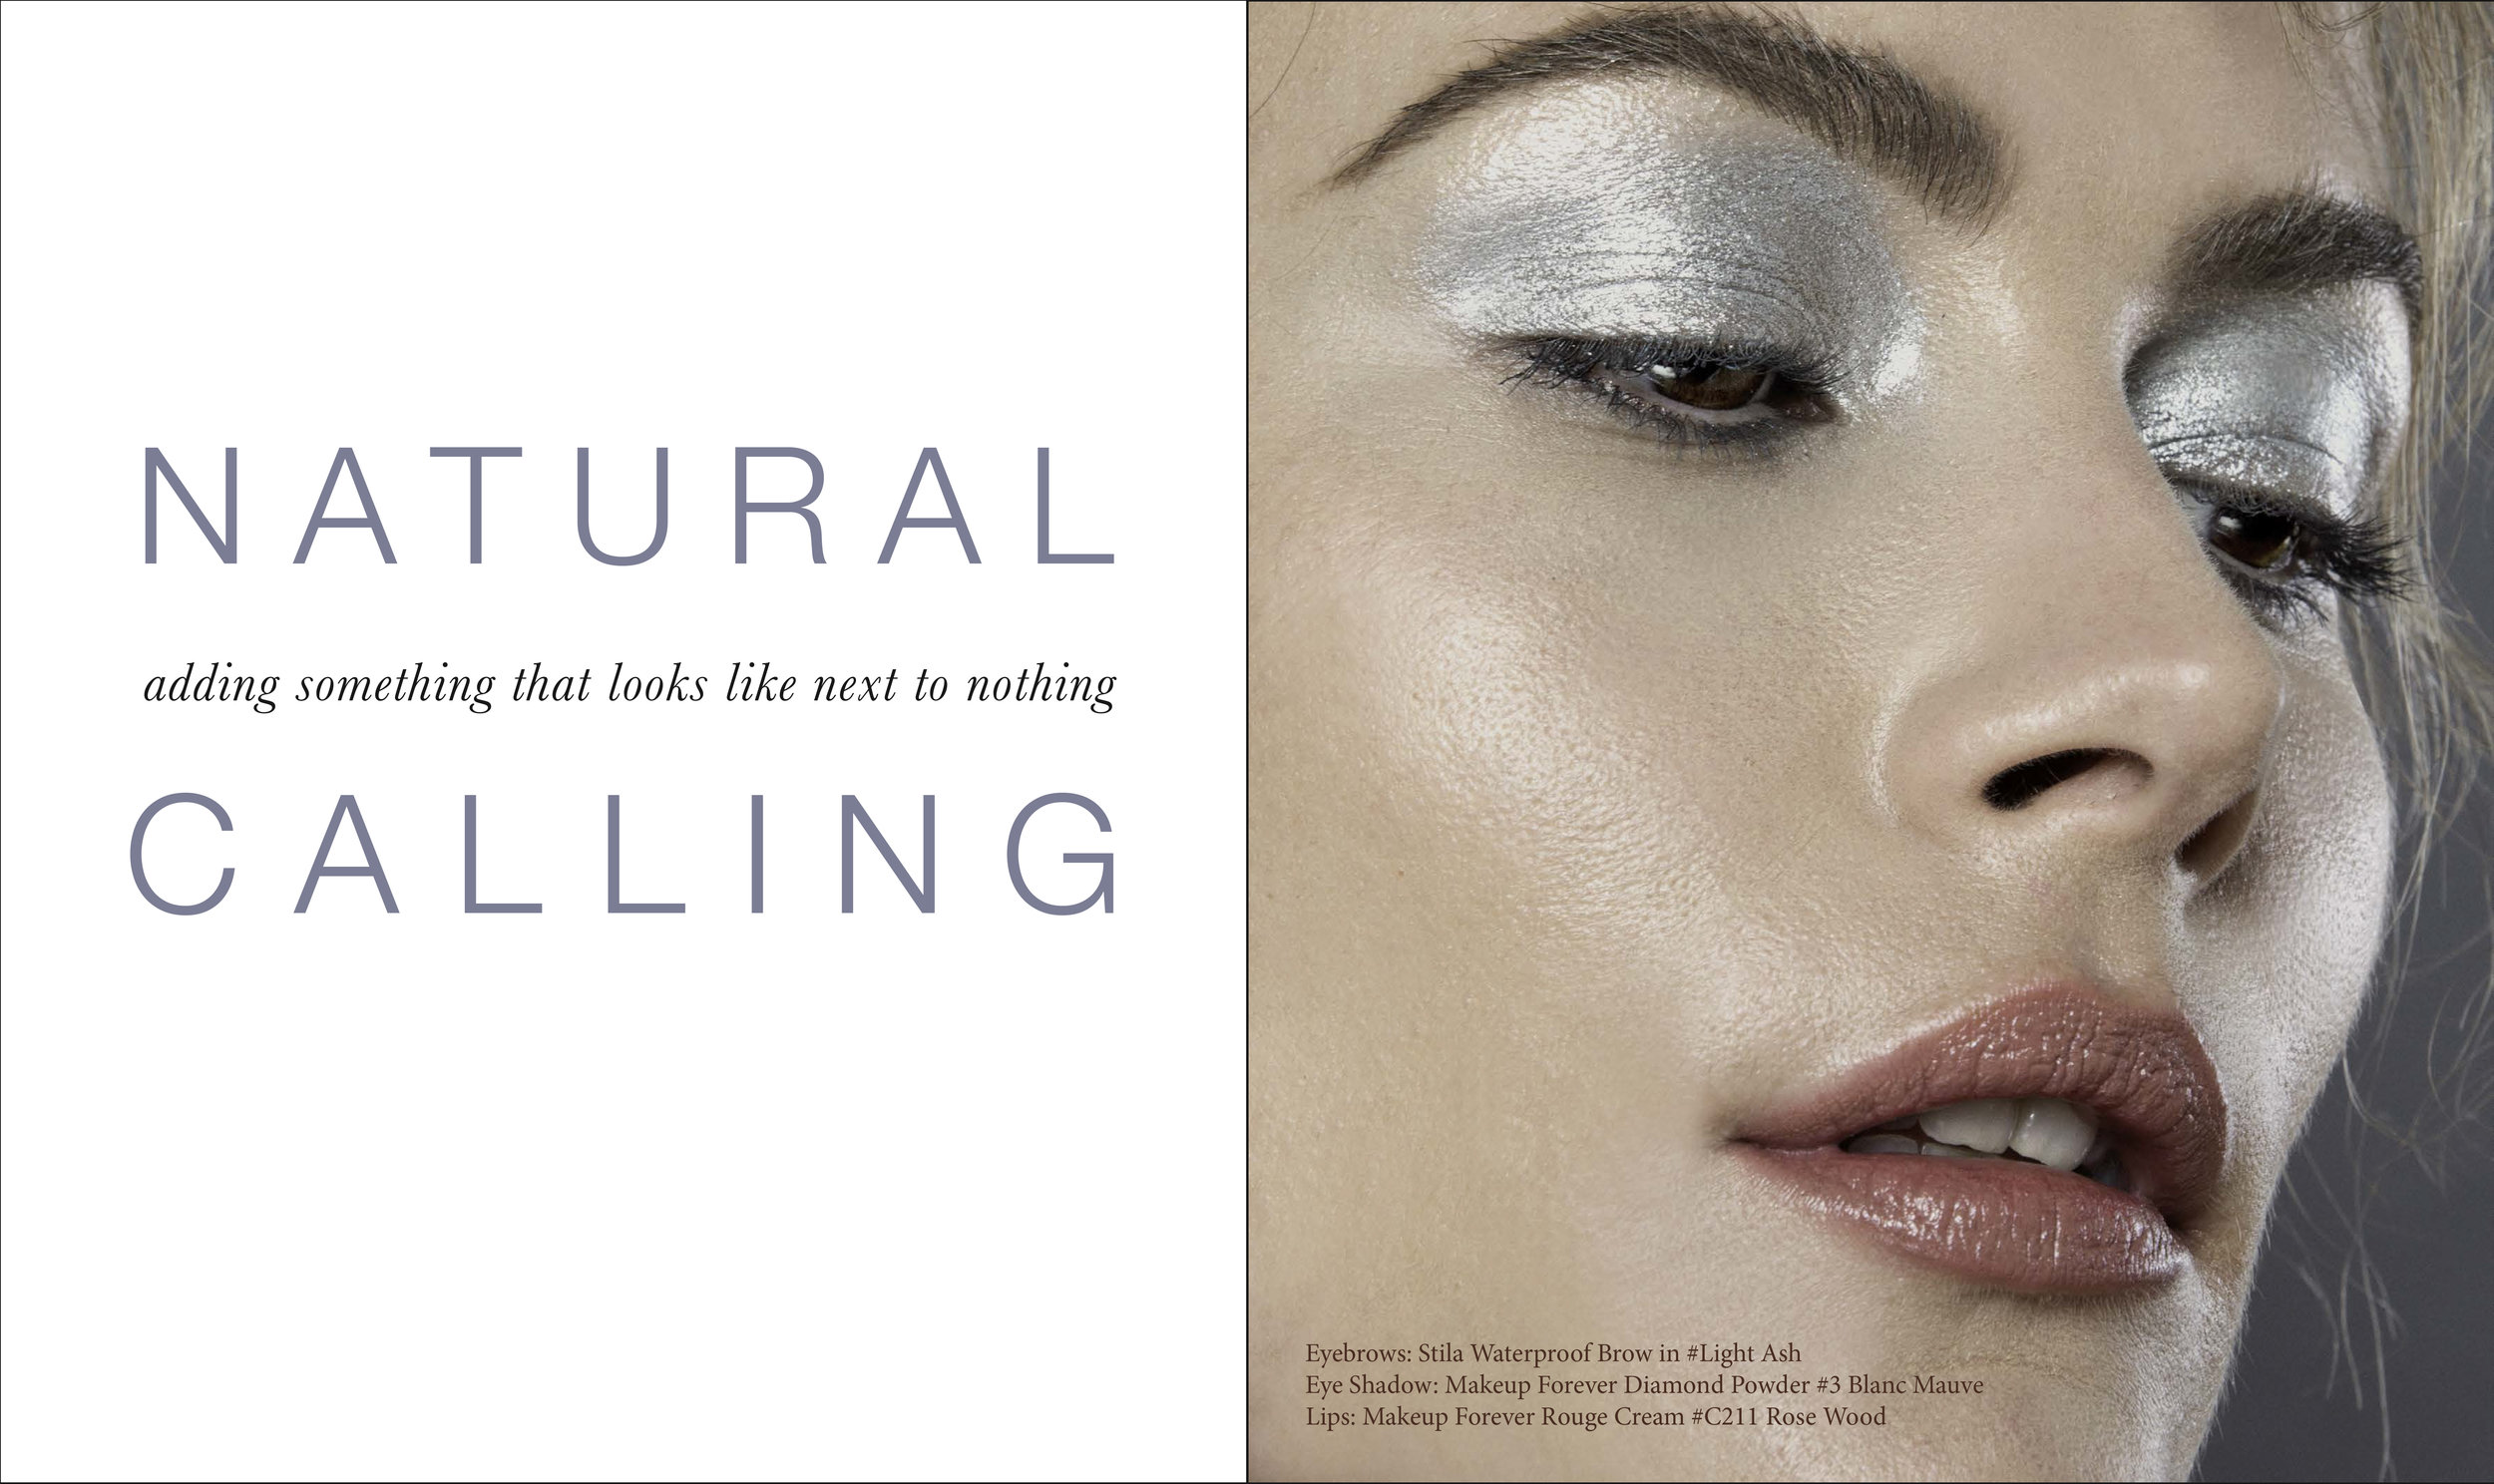 SPIRIT & FLESH Magazine - IN BLOOM Issue - Rose Mcgowan - by Mike Ruiz, Alison Hernon-100.jpg